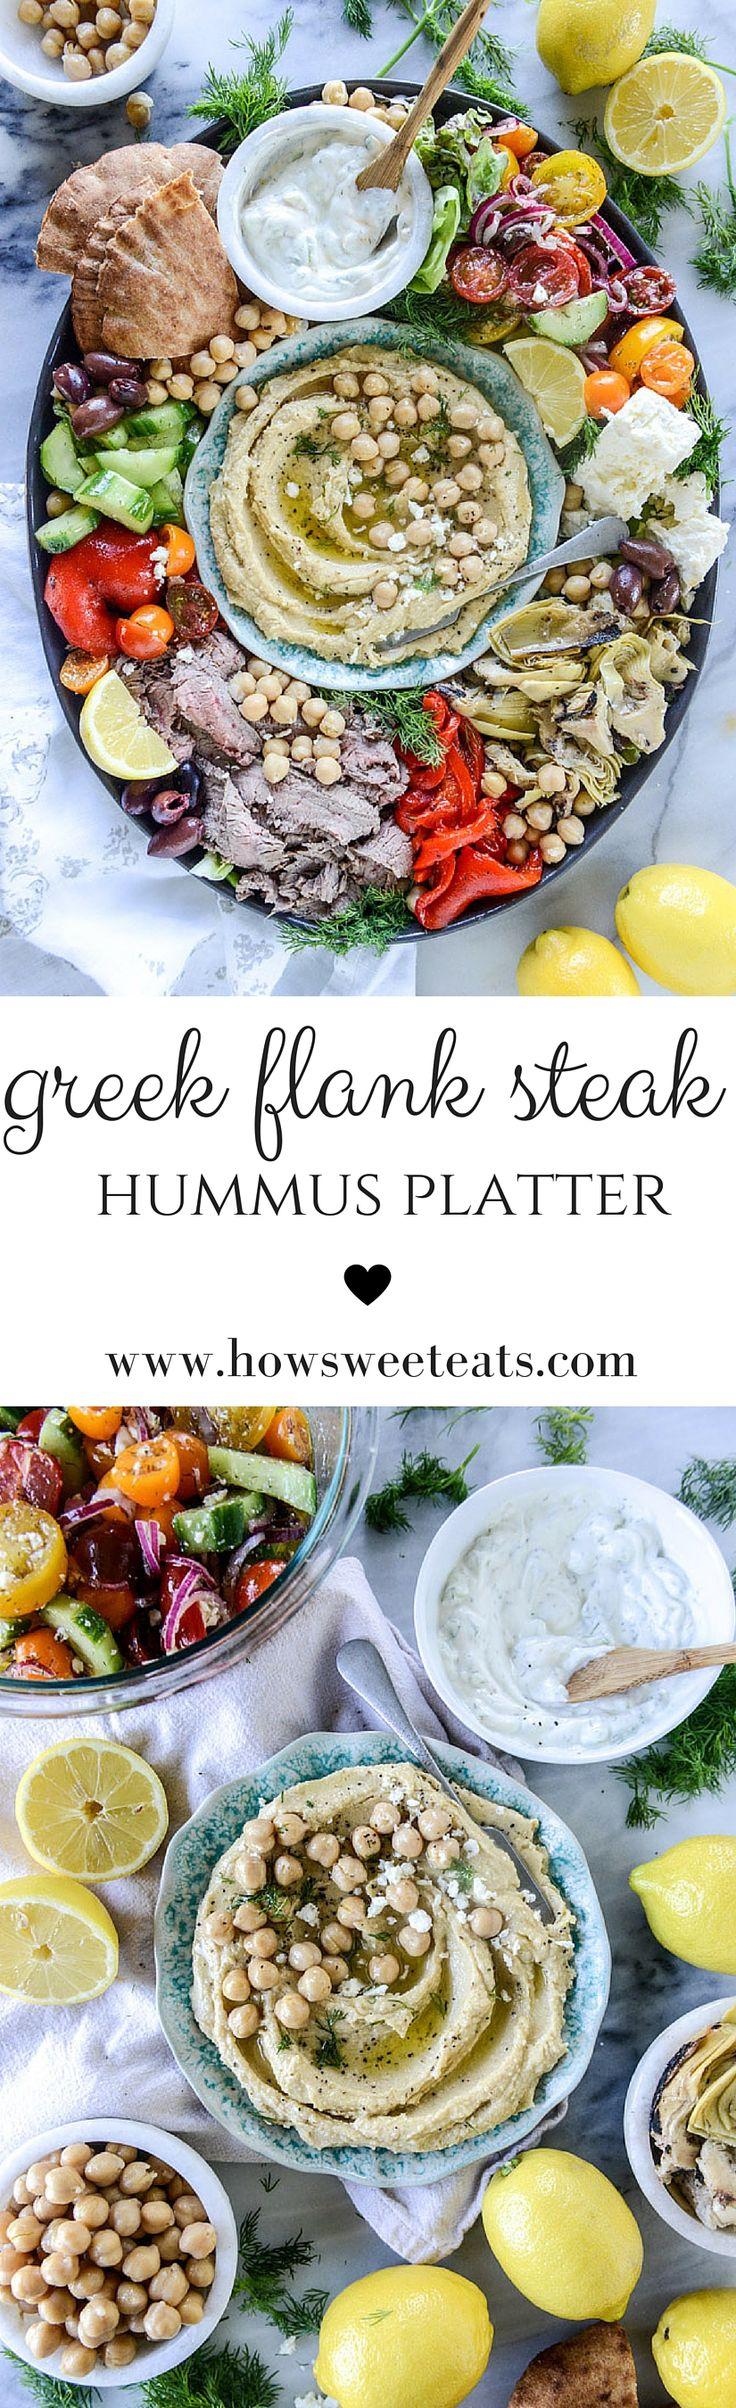 marinated greek flank steak hummus platter by @howsweeteats I howsweeteats.com